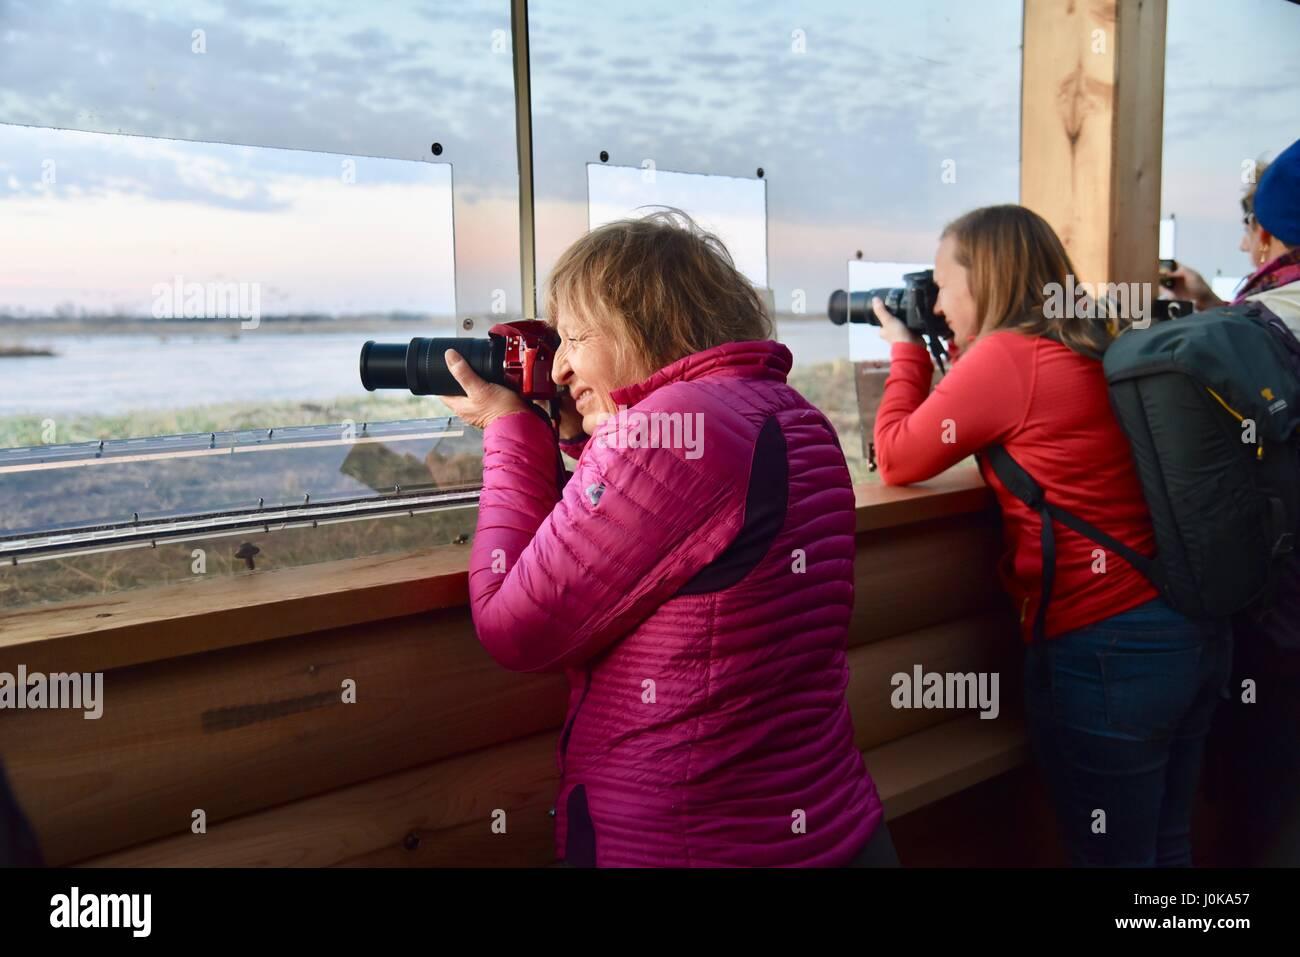 Photo Blind Stock Photos & Photo Blind Stock Images - Alamy